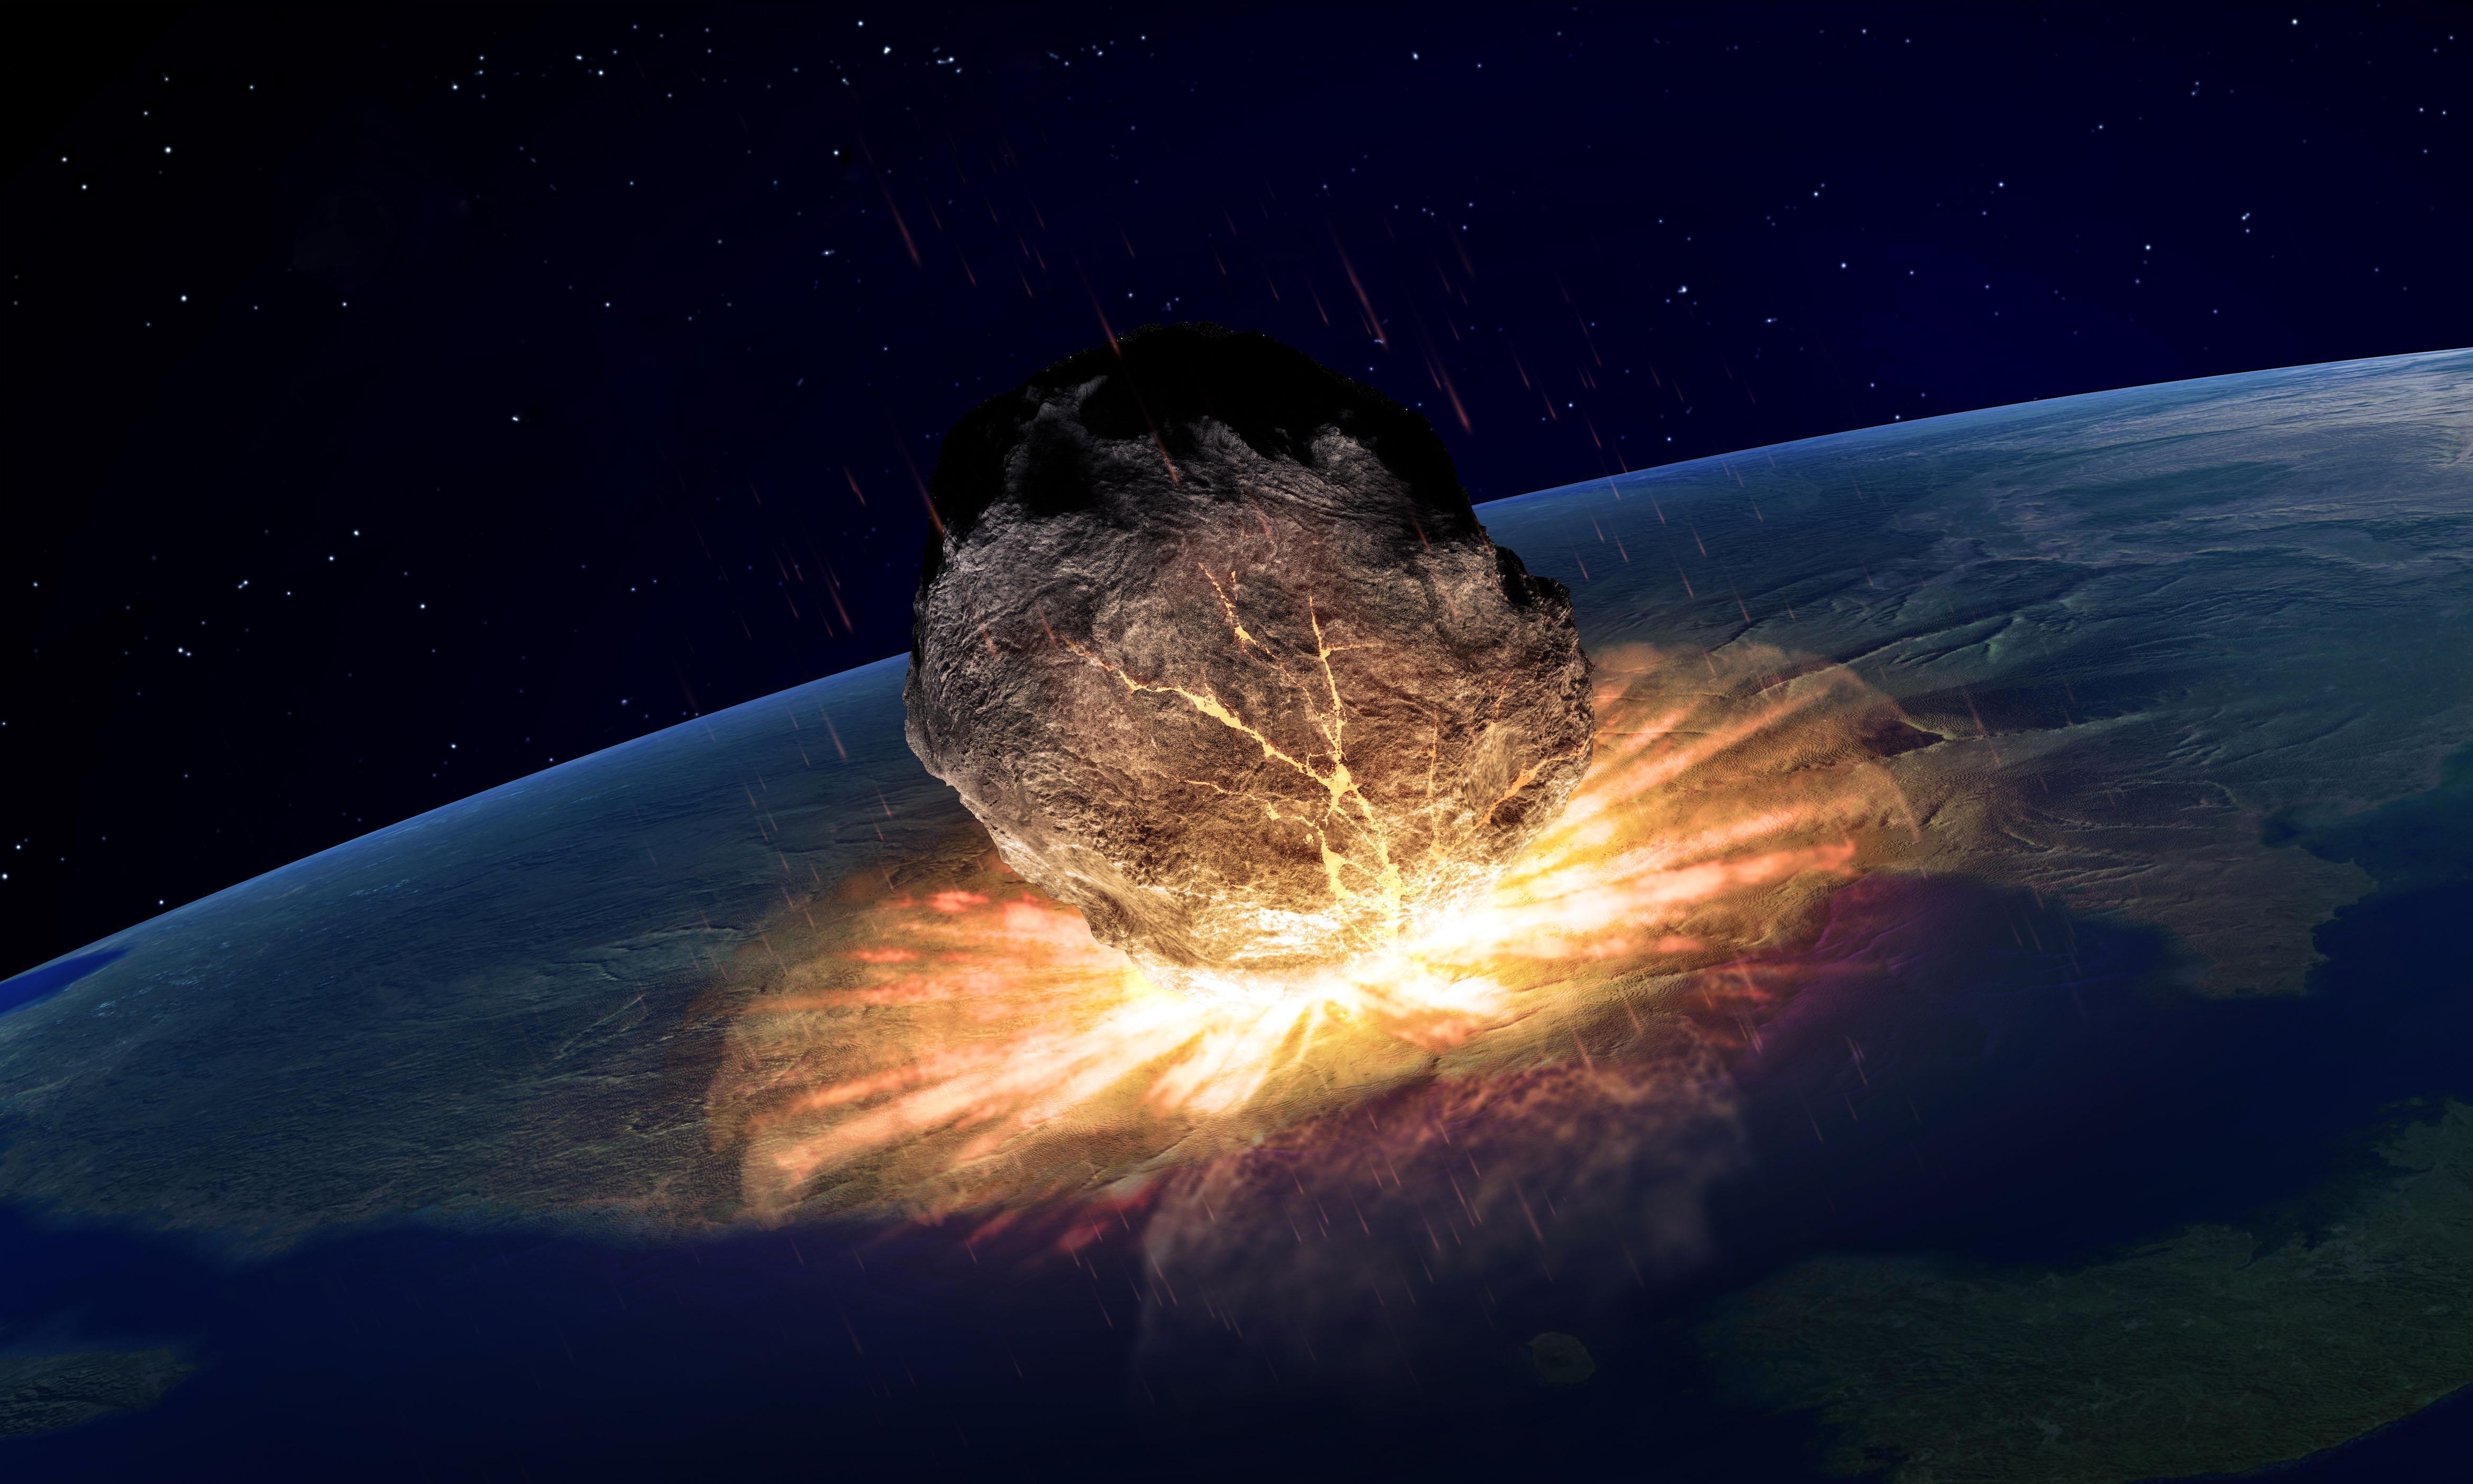 Dinosaur-killing asteroid caused molten rock to burst from ocean floor – study